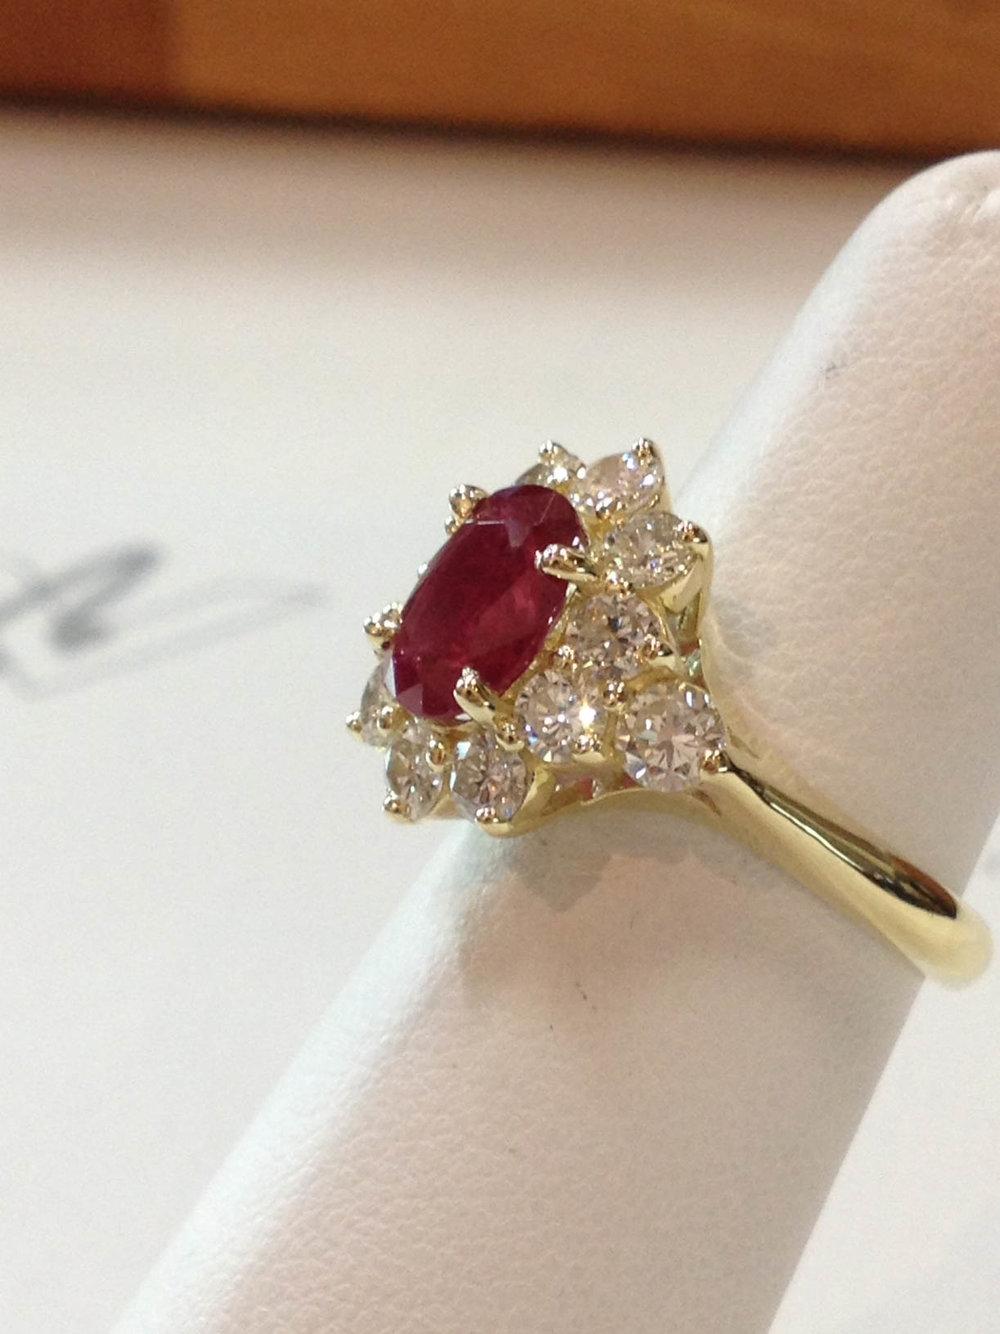 New Ring, New Gems